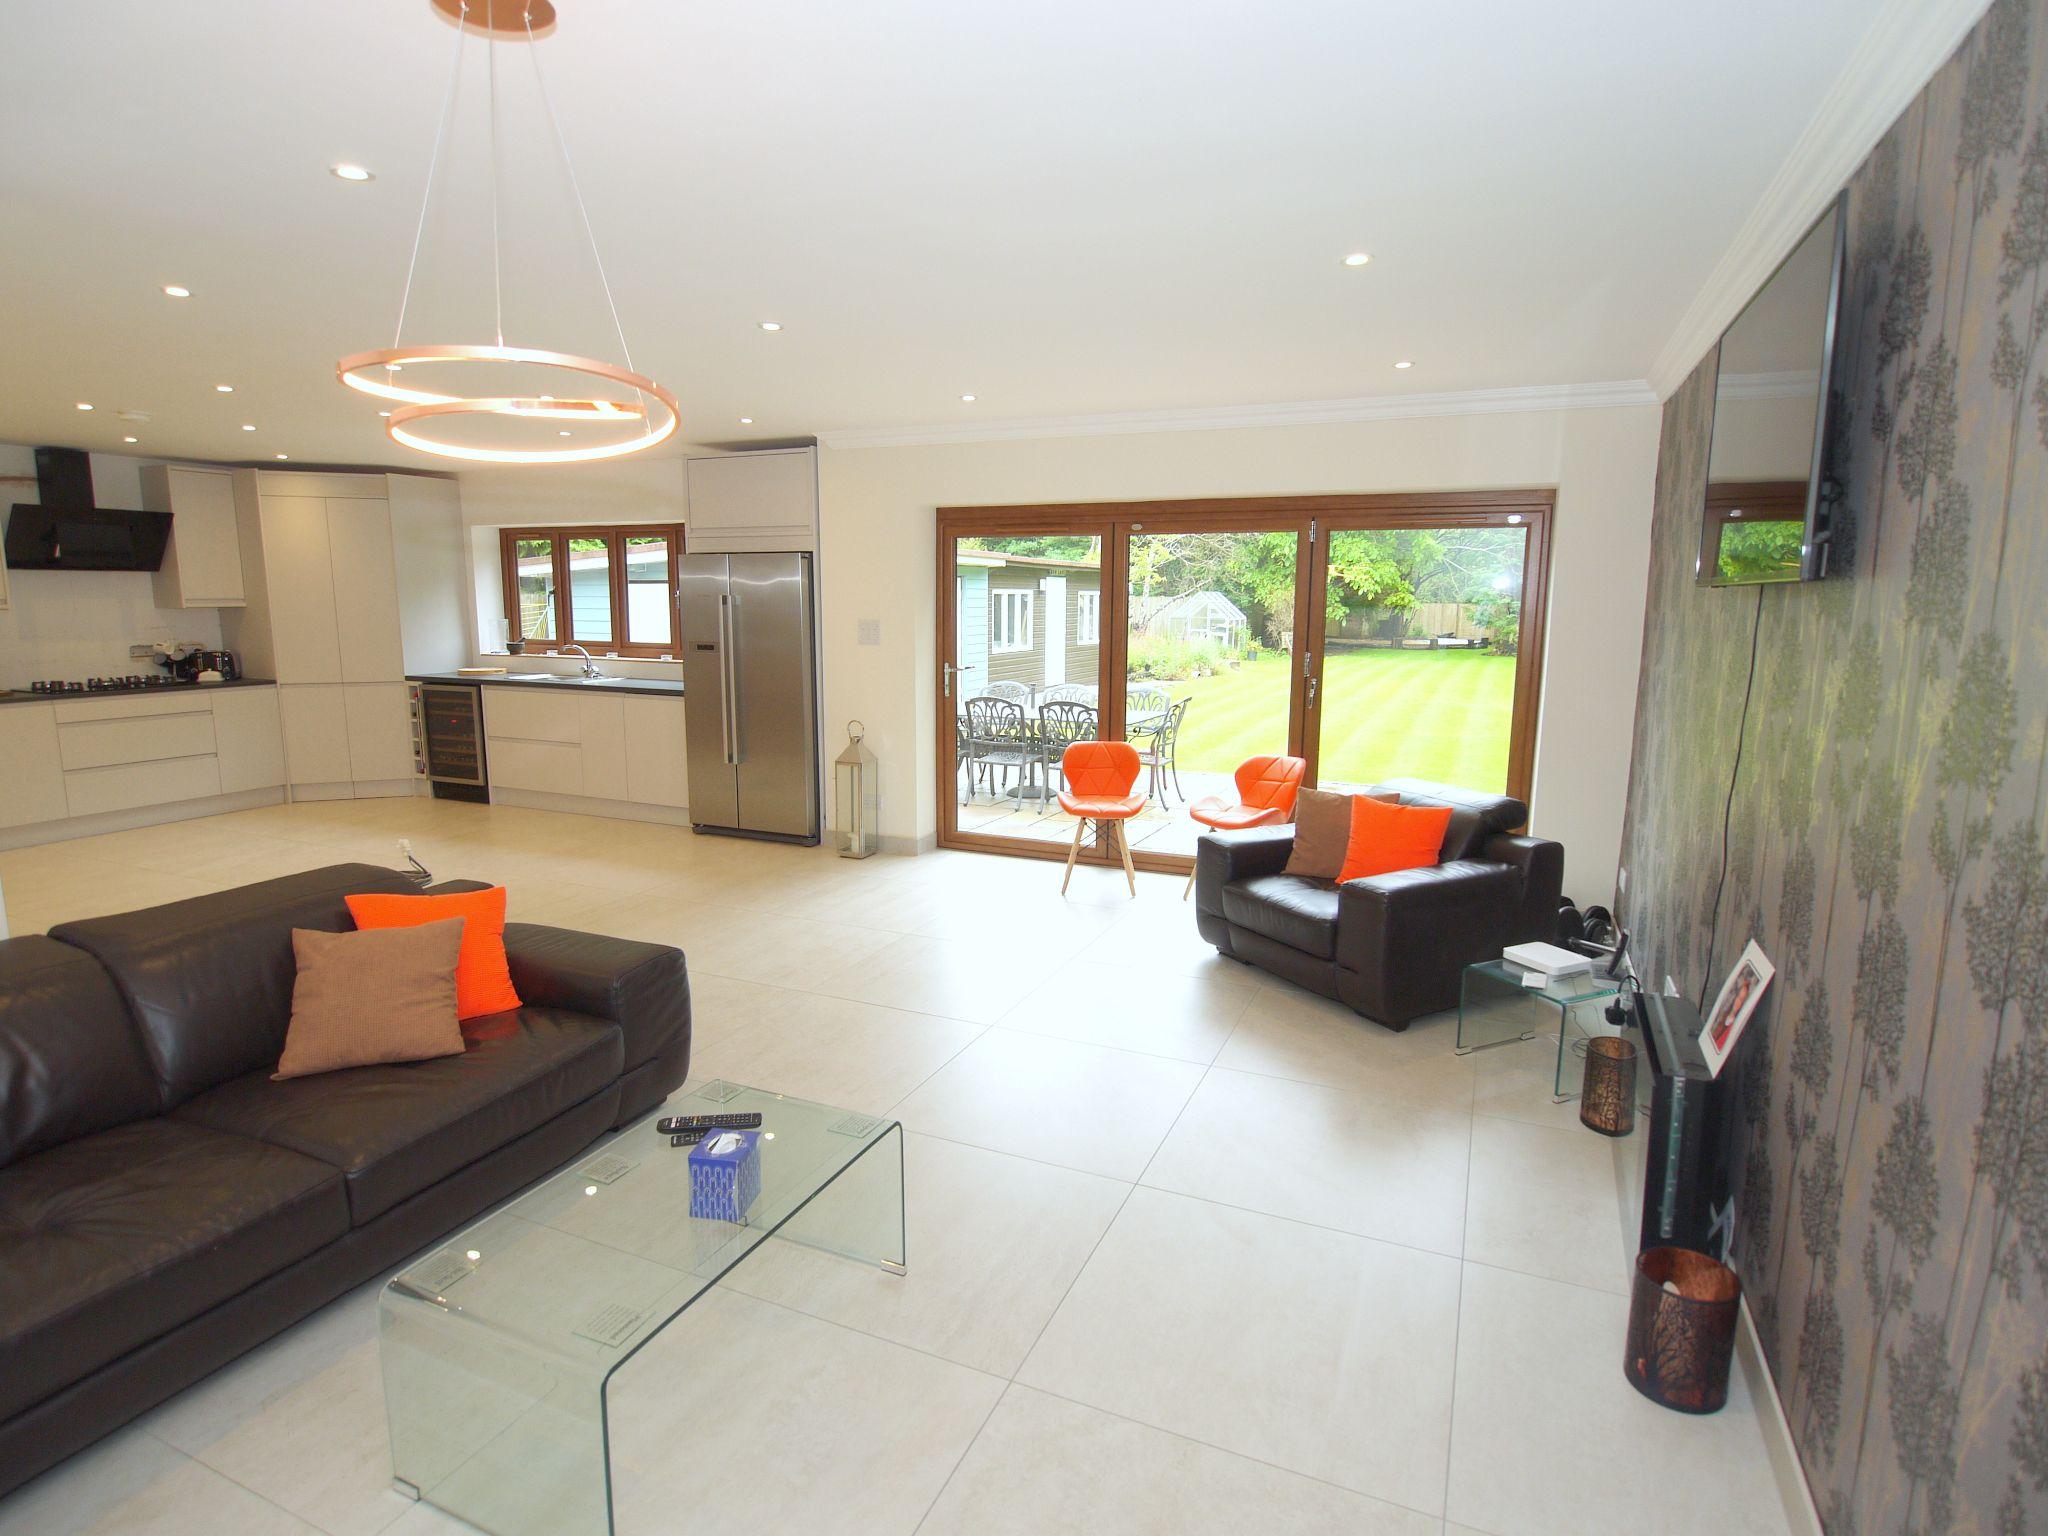 5 bedroom detached house Sold in Sevenoaks - Photograph 3